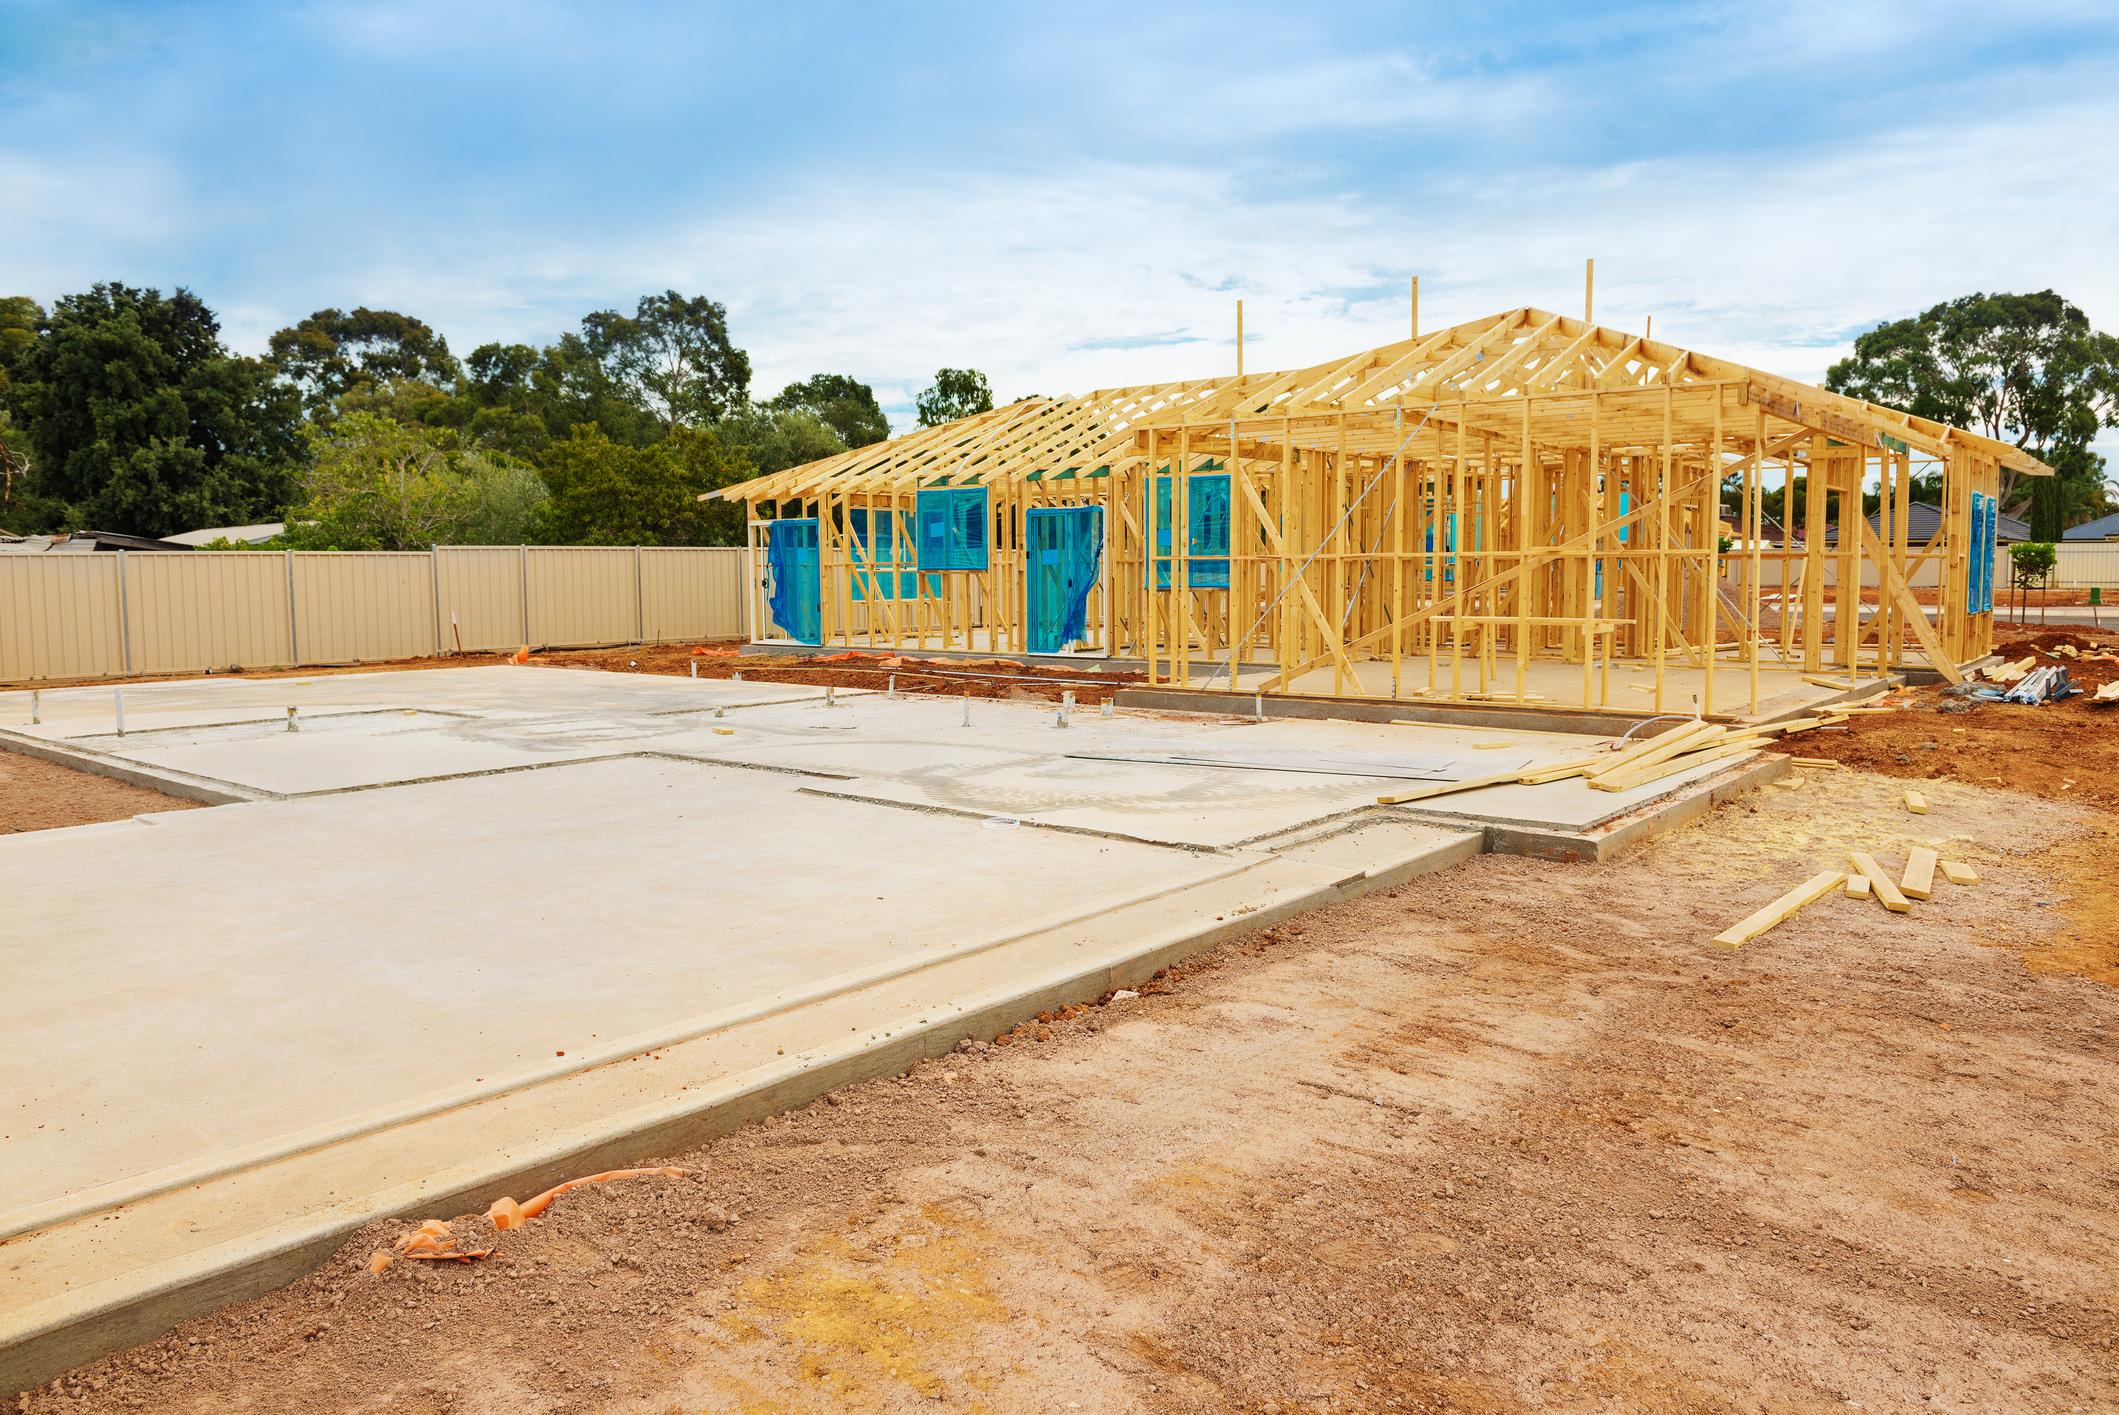 A home construction site